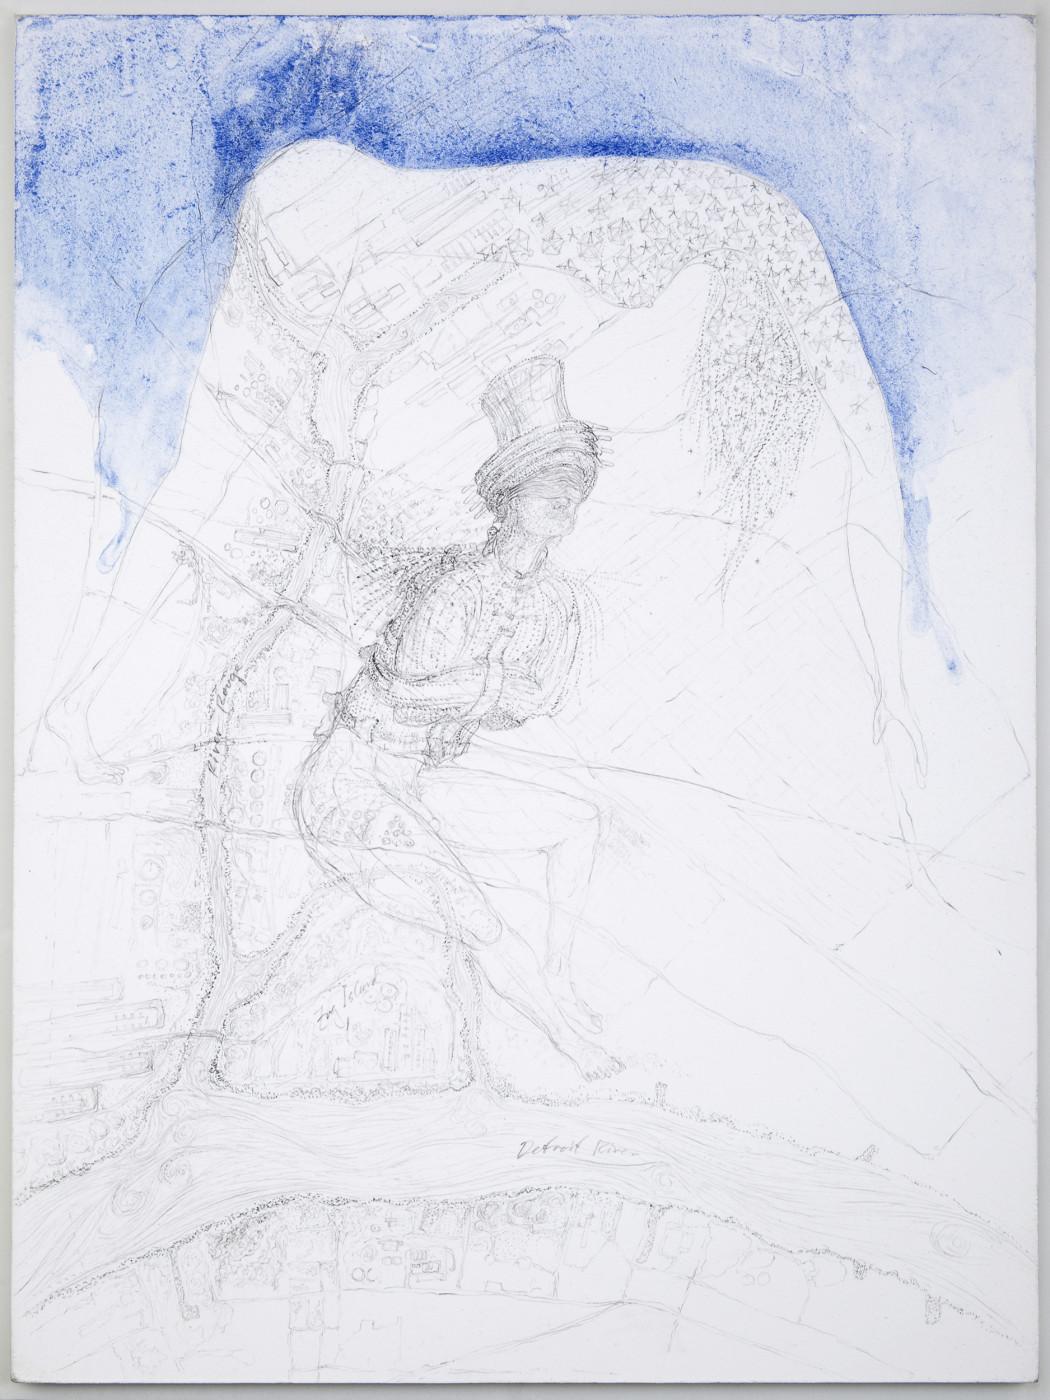 "<div class=""artwork_caption""><p>KHU River Rouge, 2009</p></div>"